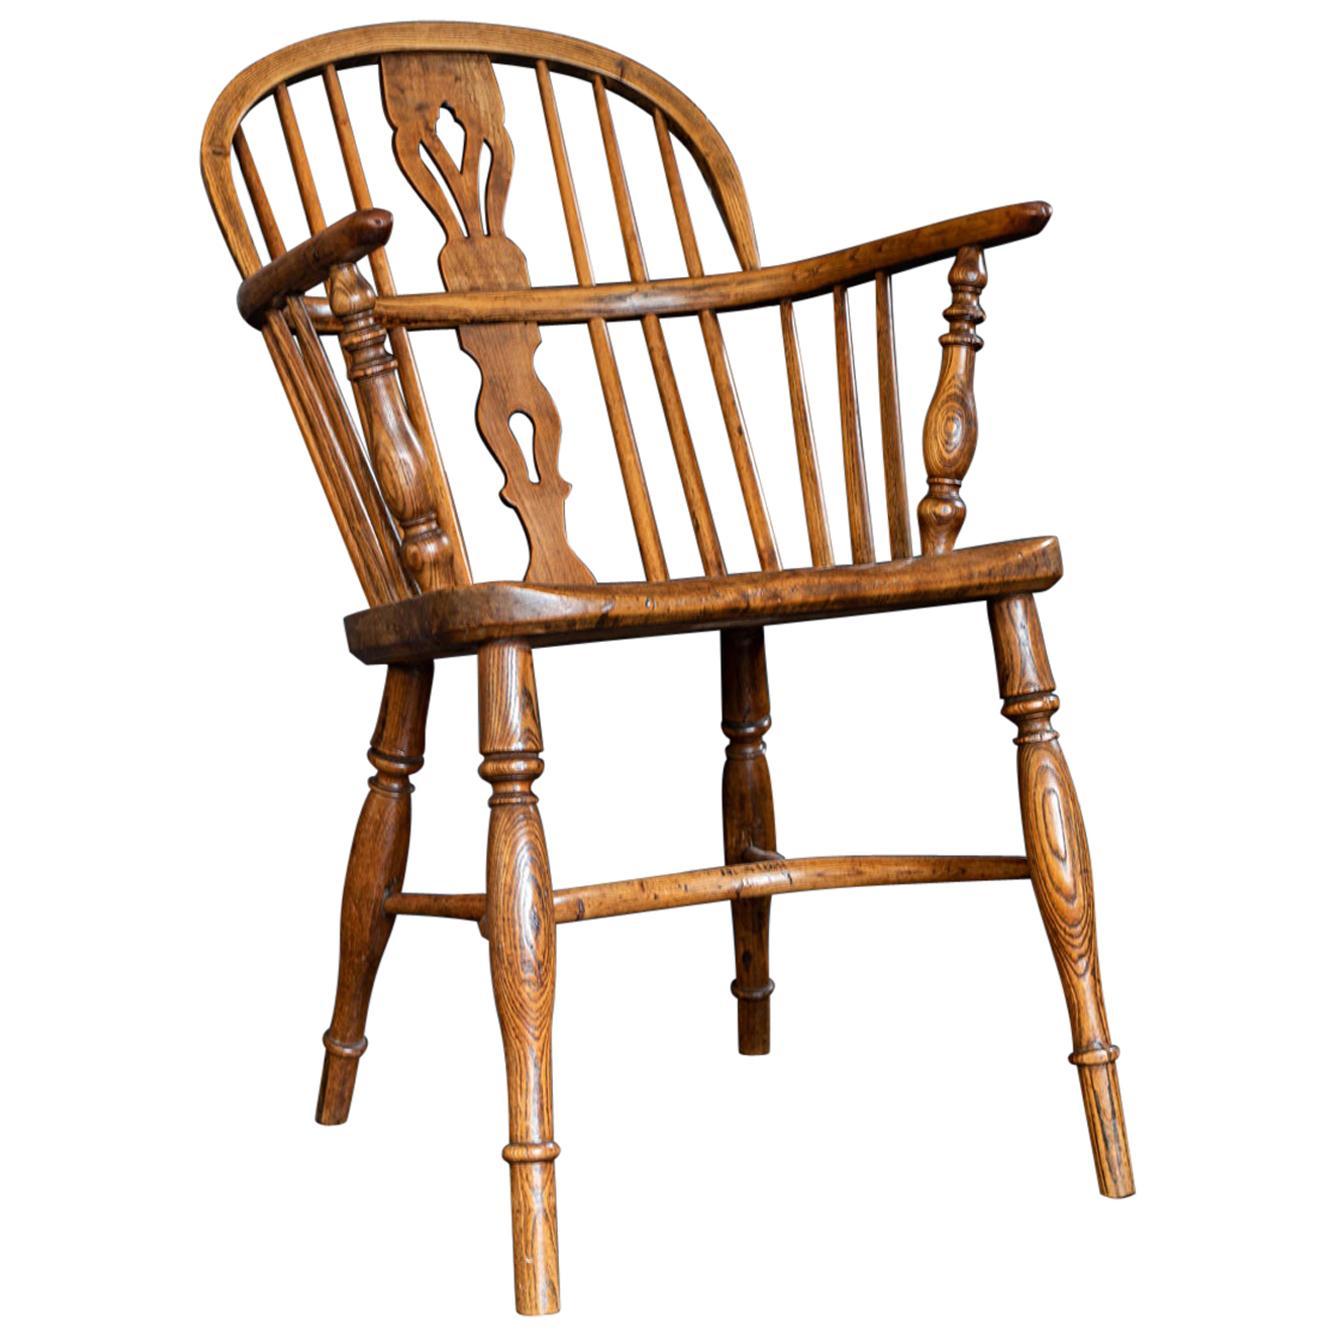 English 19th Century Windsor Chair